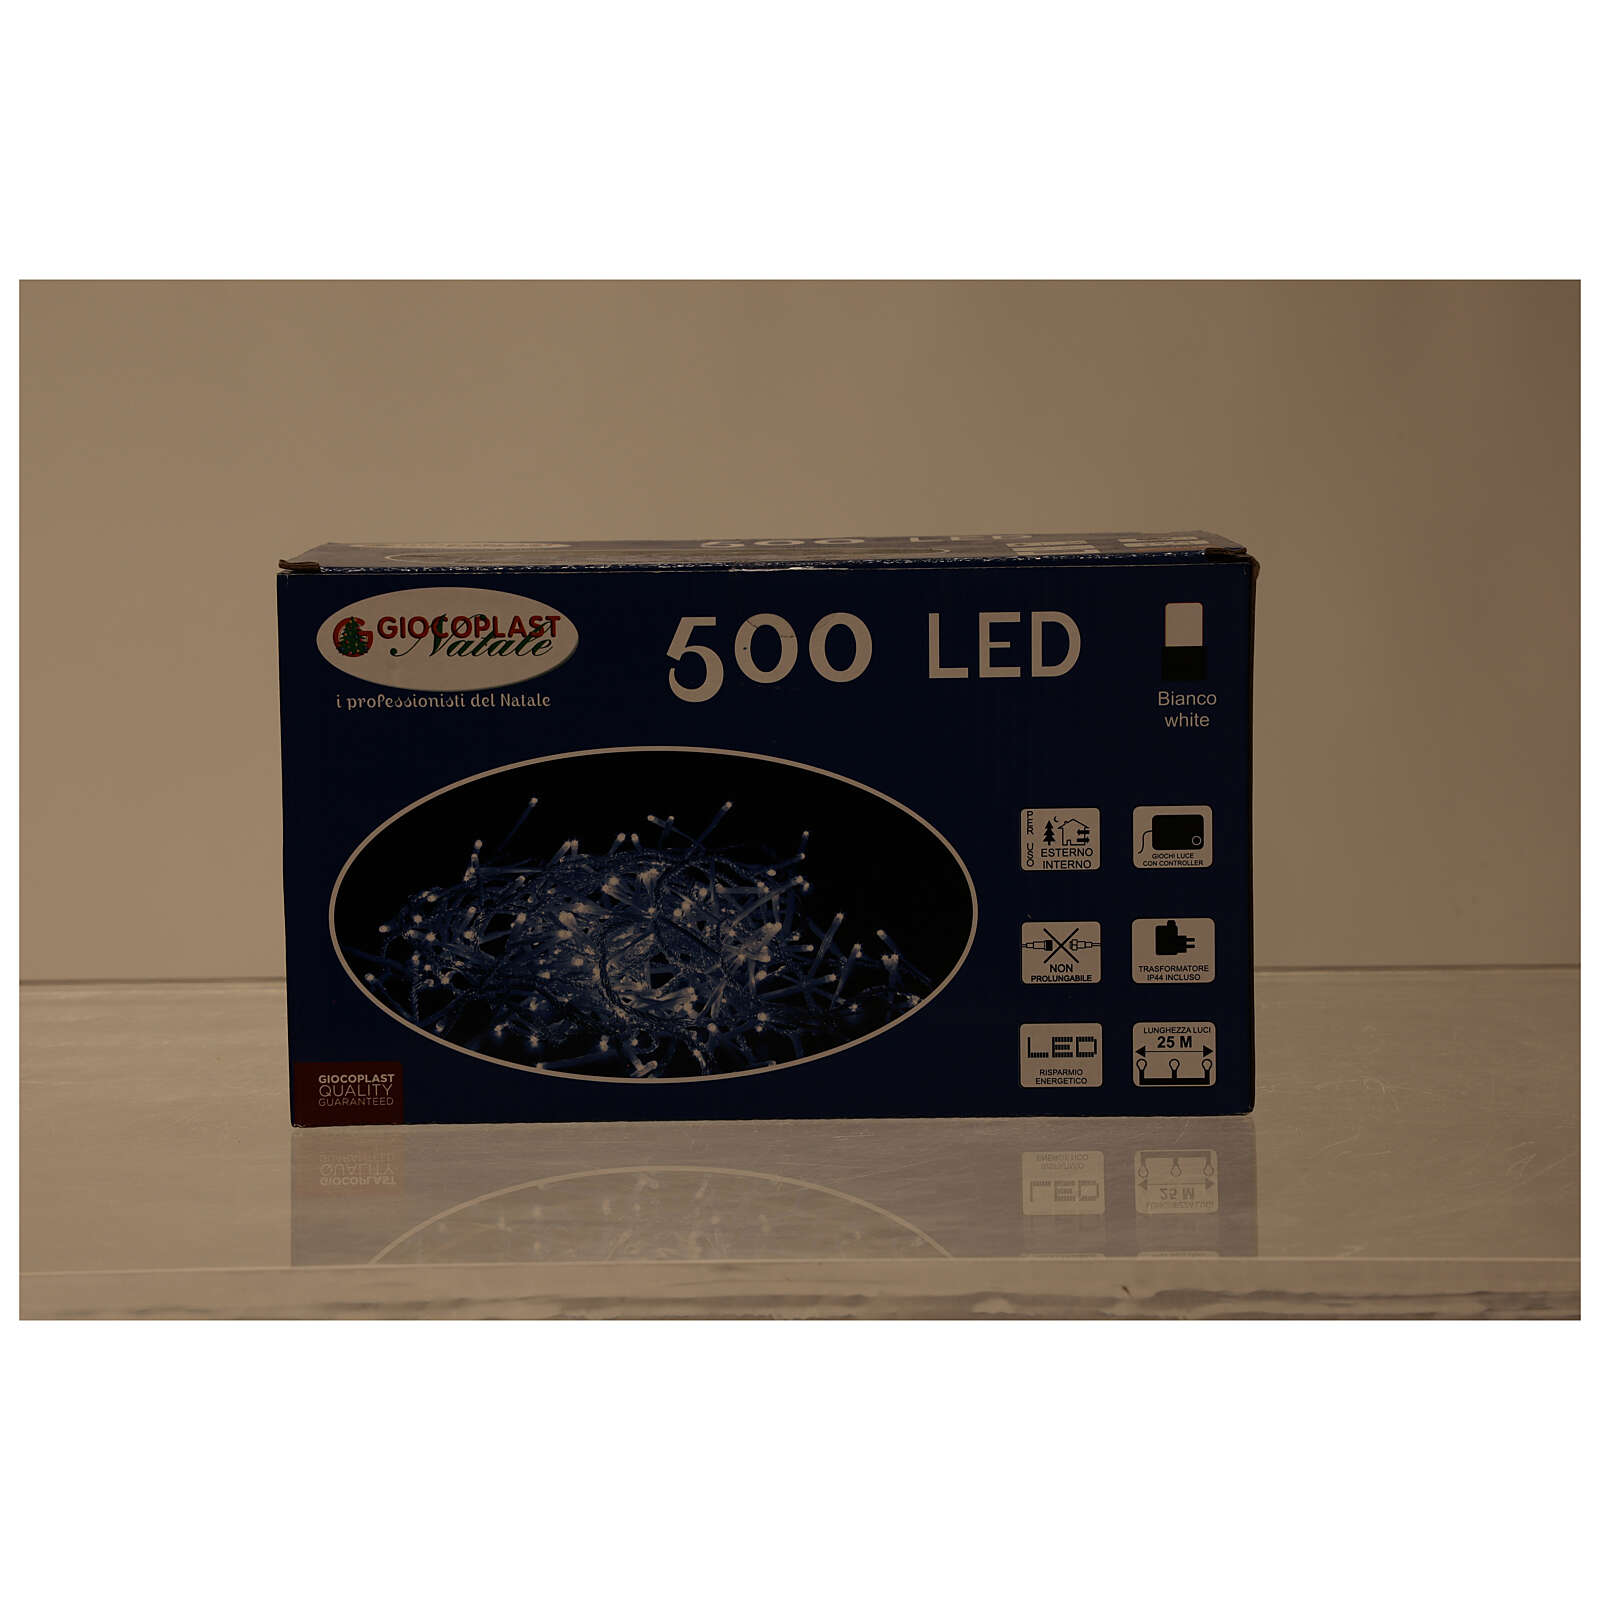 Catena luminosa 500 led bianco freddo cavo trasparente esterno 220V 3